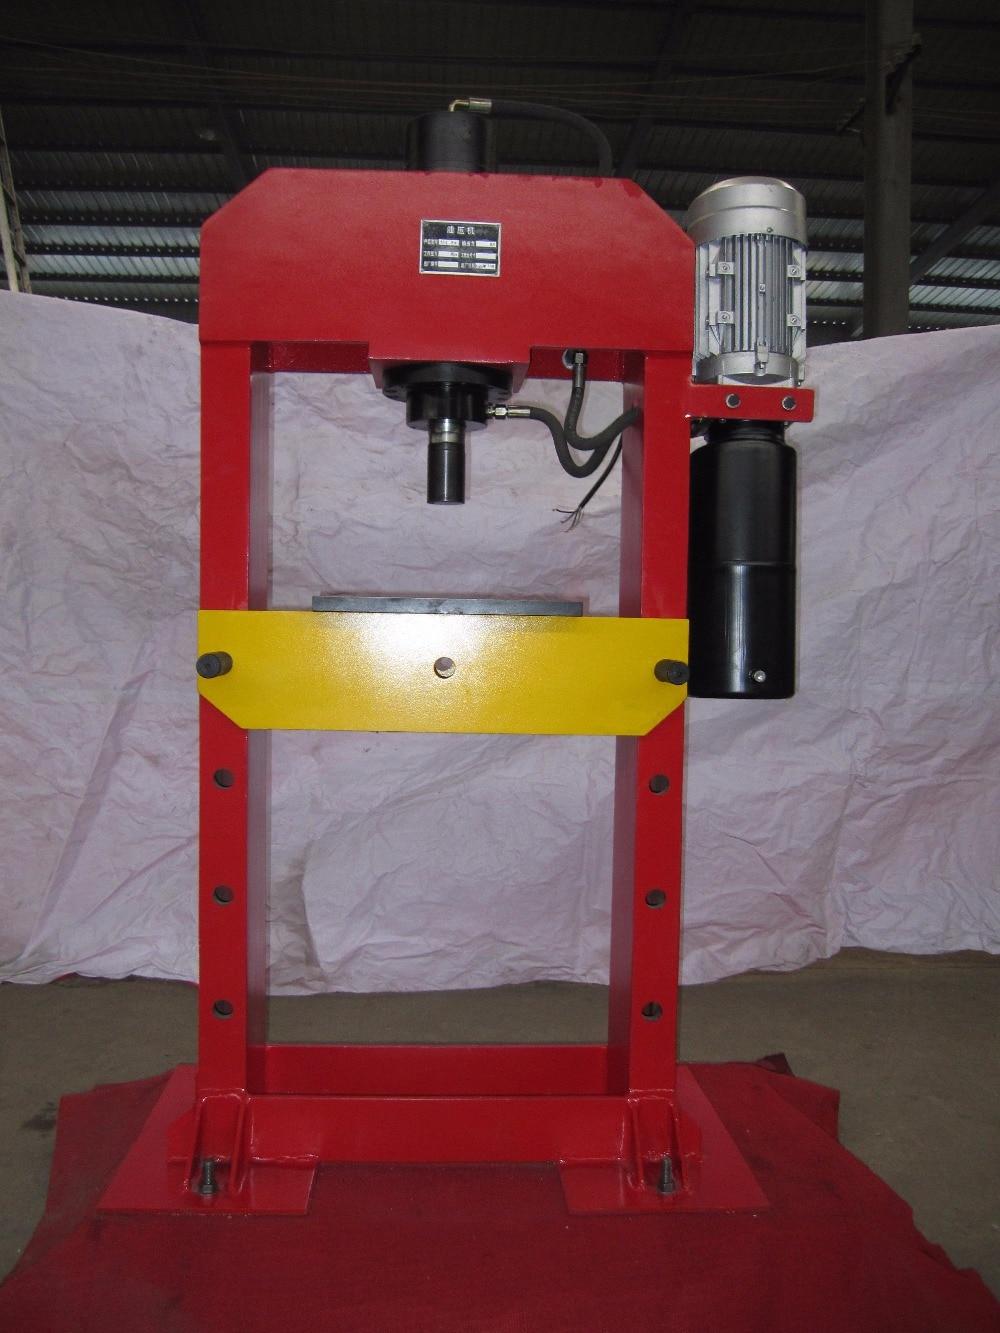 YJL 20 electric hydraulic press machine shop machinery tools